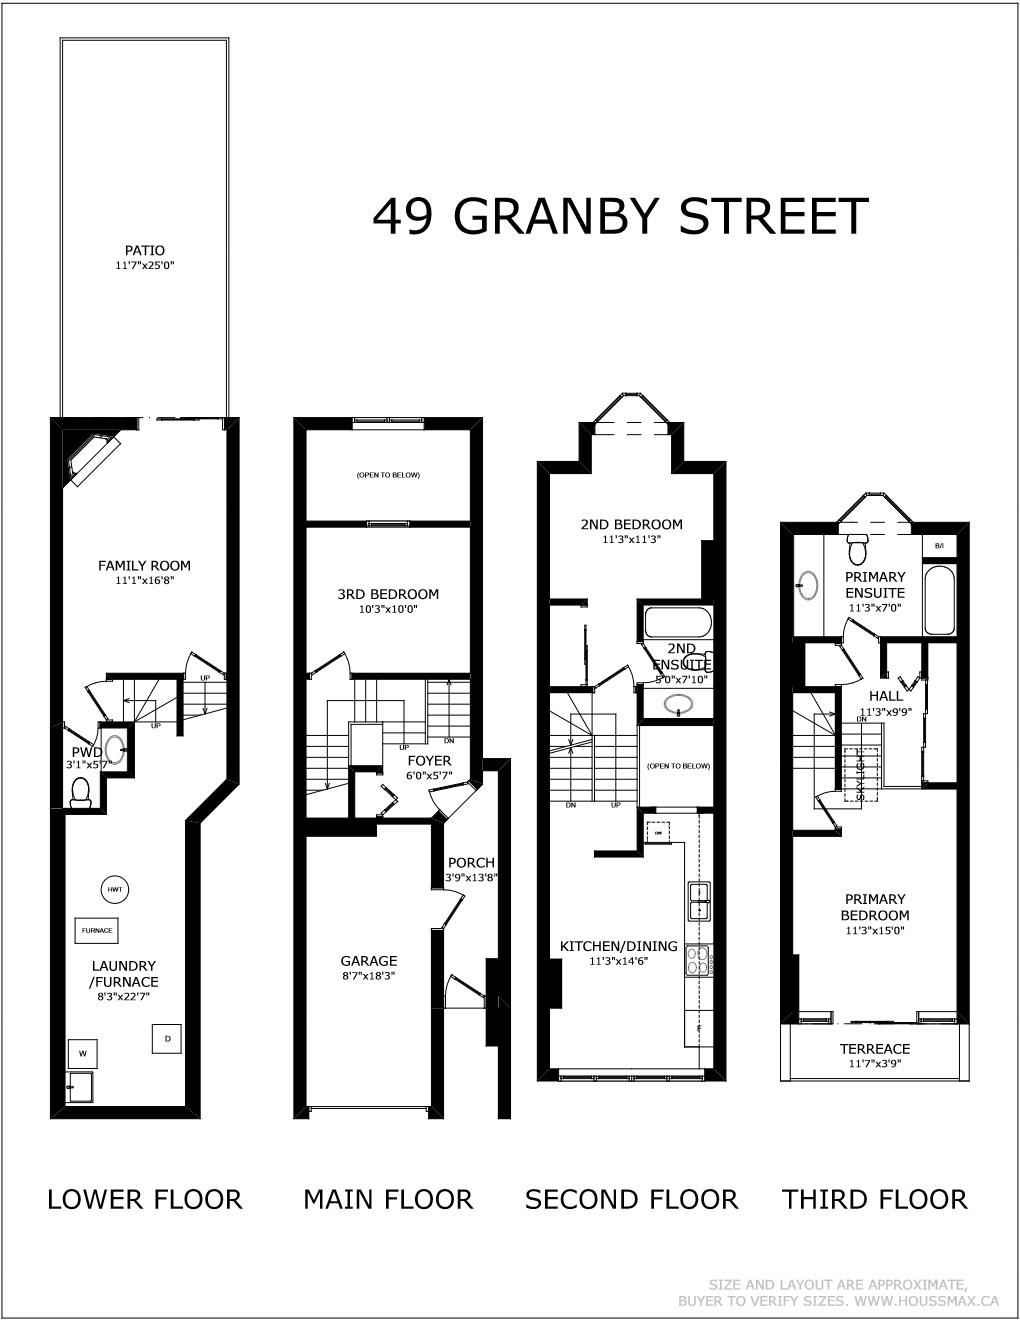 Floor plans for 49 Granby St